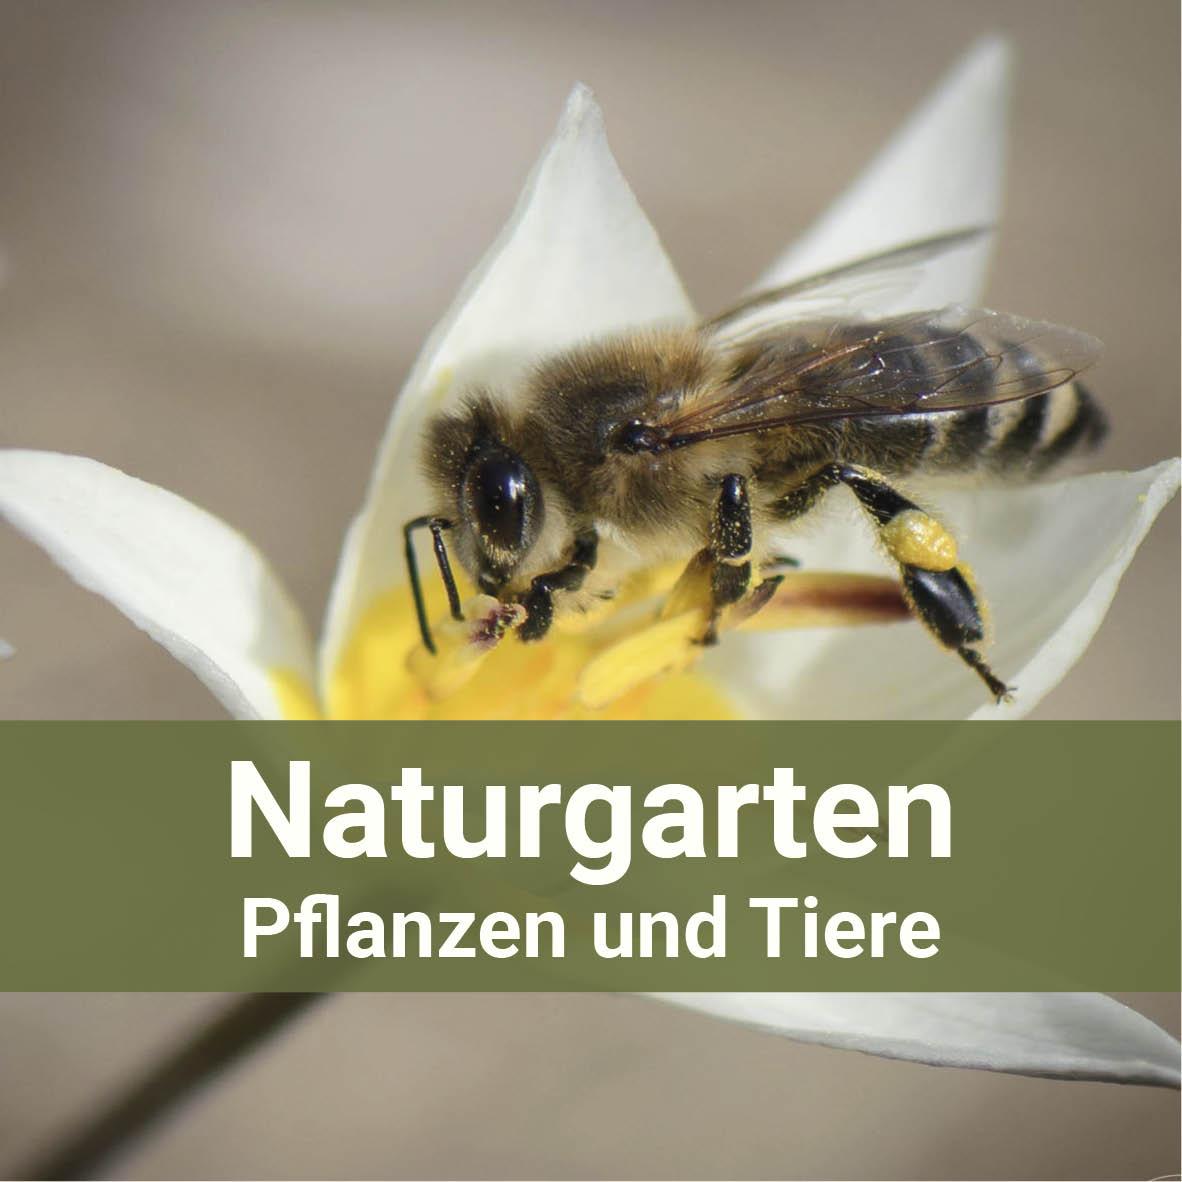 Naturgarten im Marchfeld